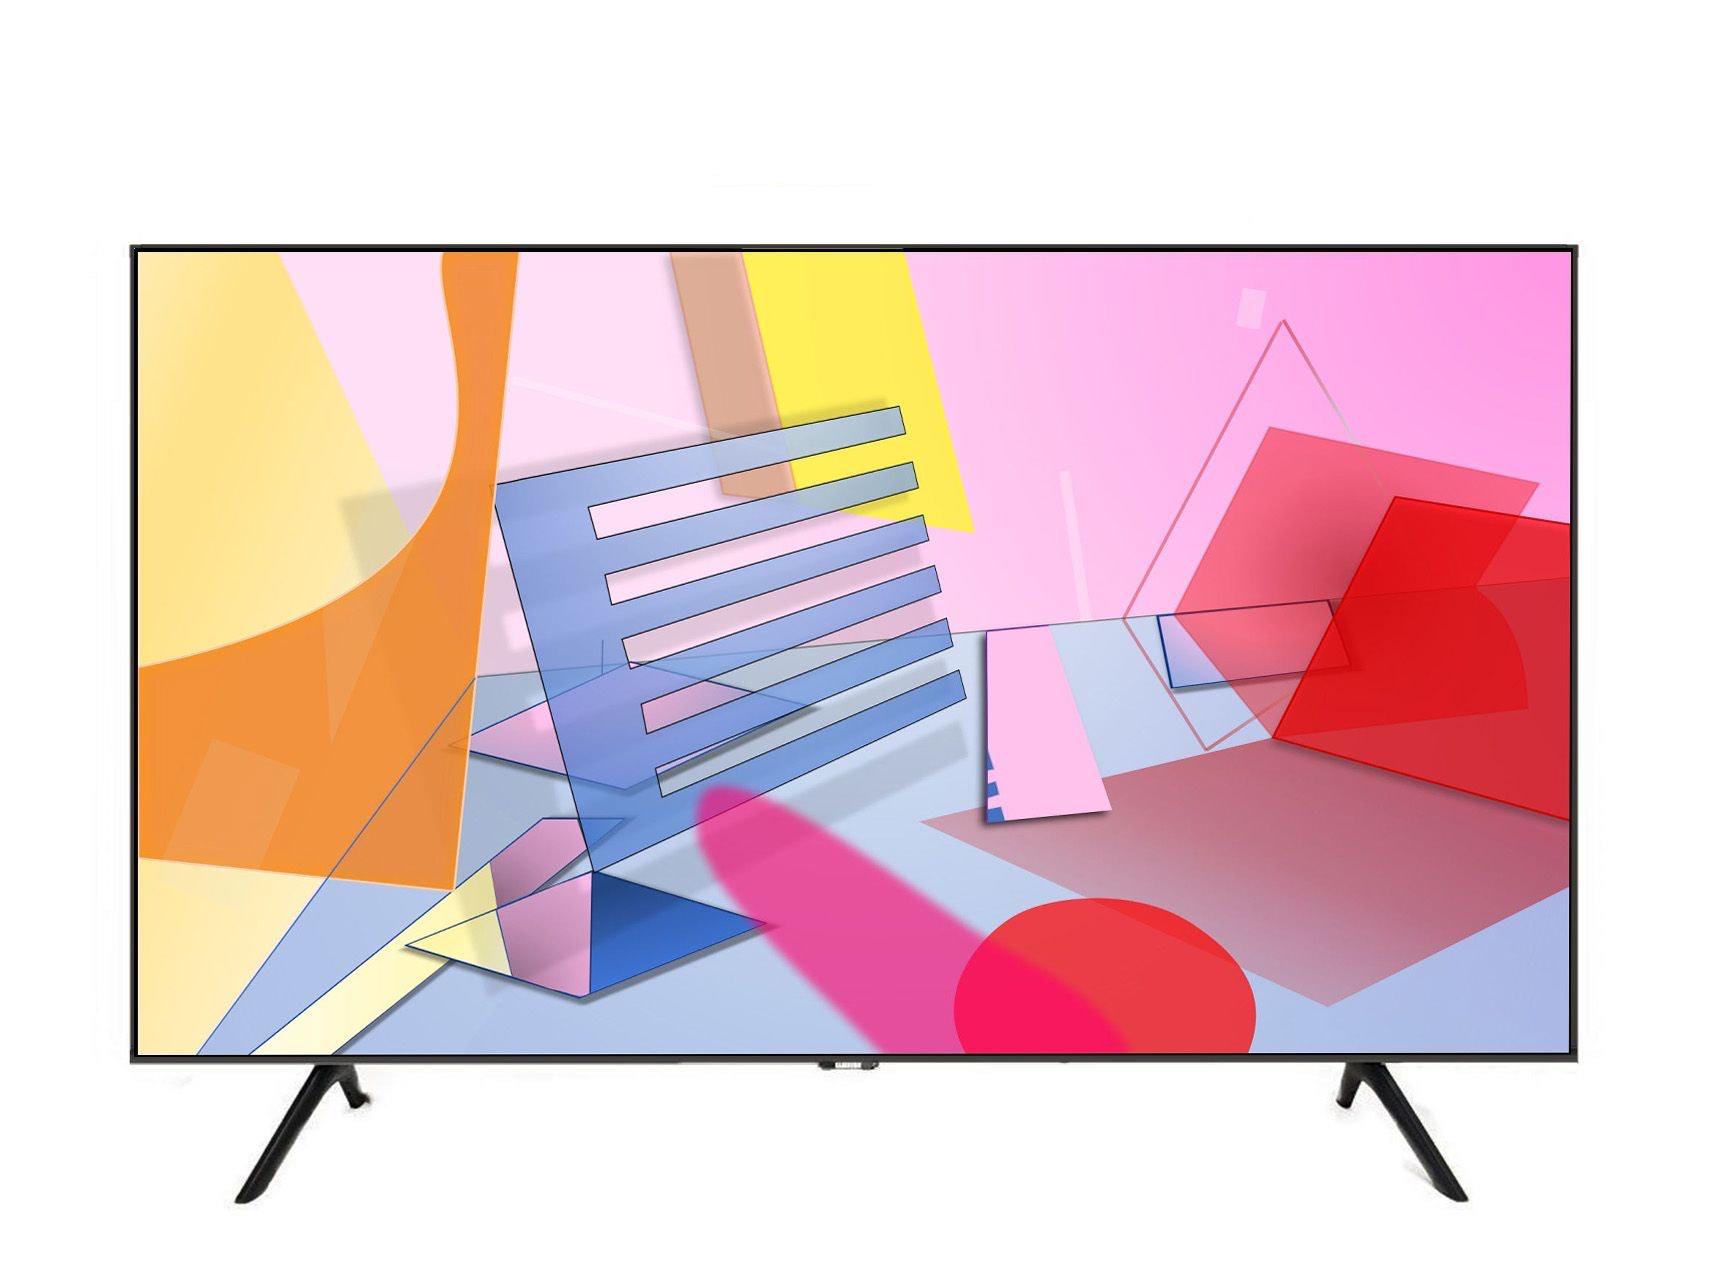 Samsung Fernseher QLED Q55Q60T 55 Zoll Smart TV